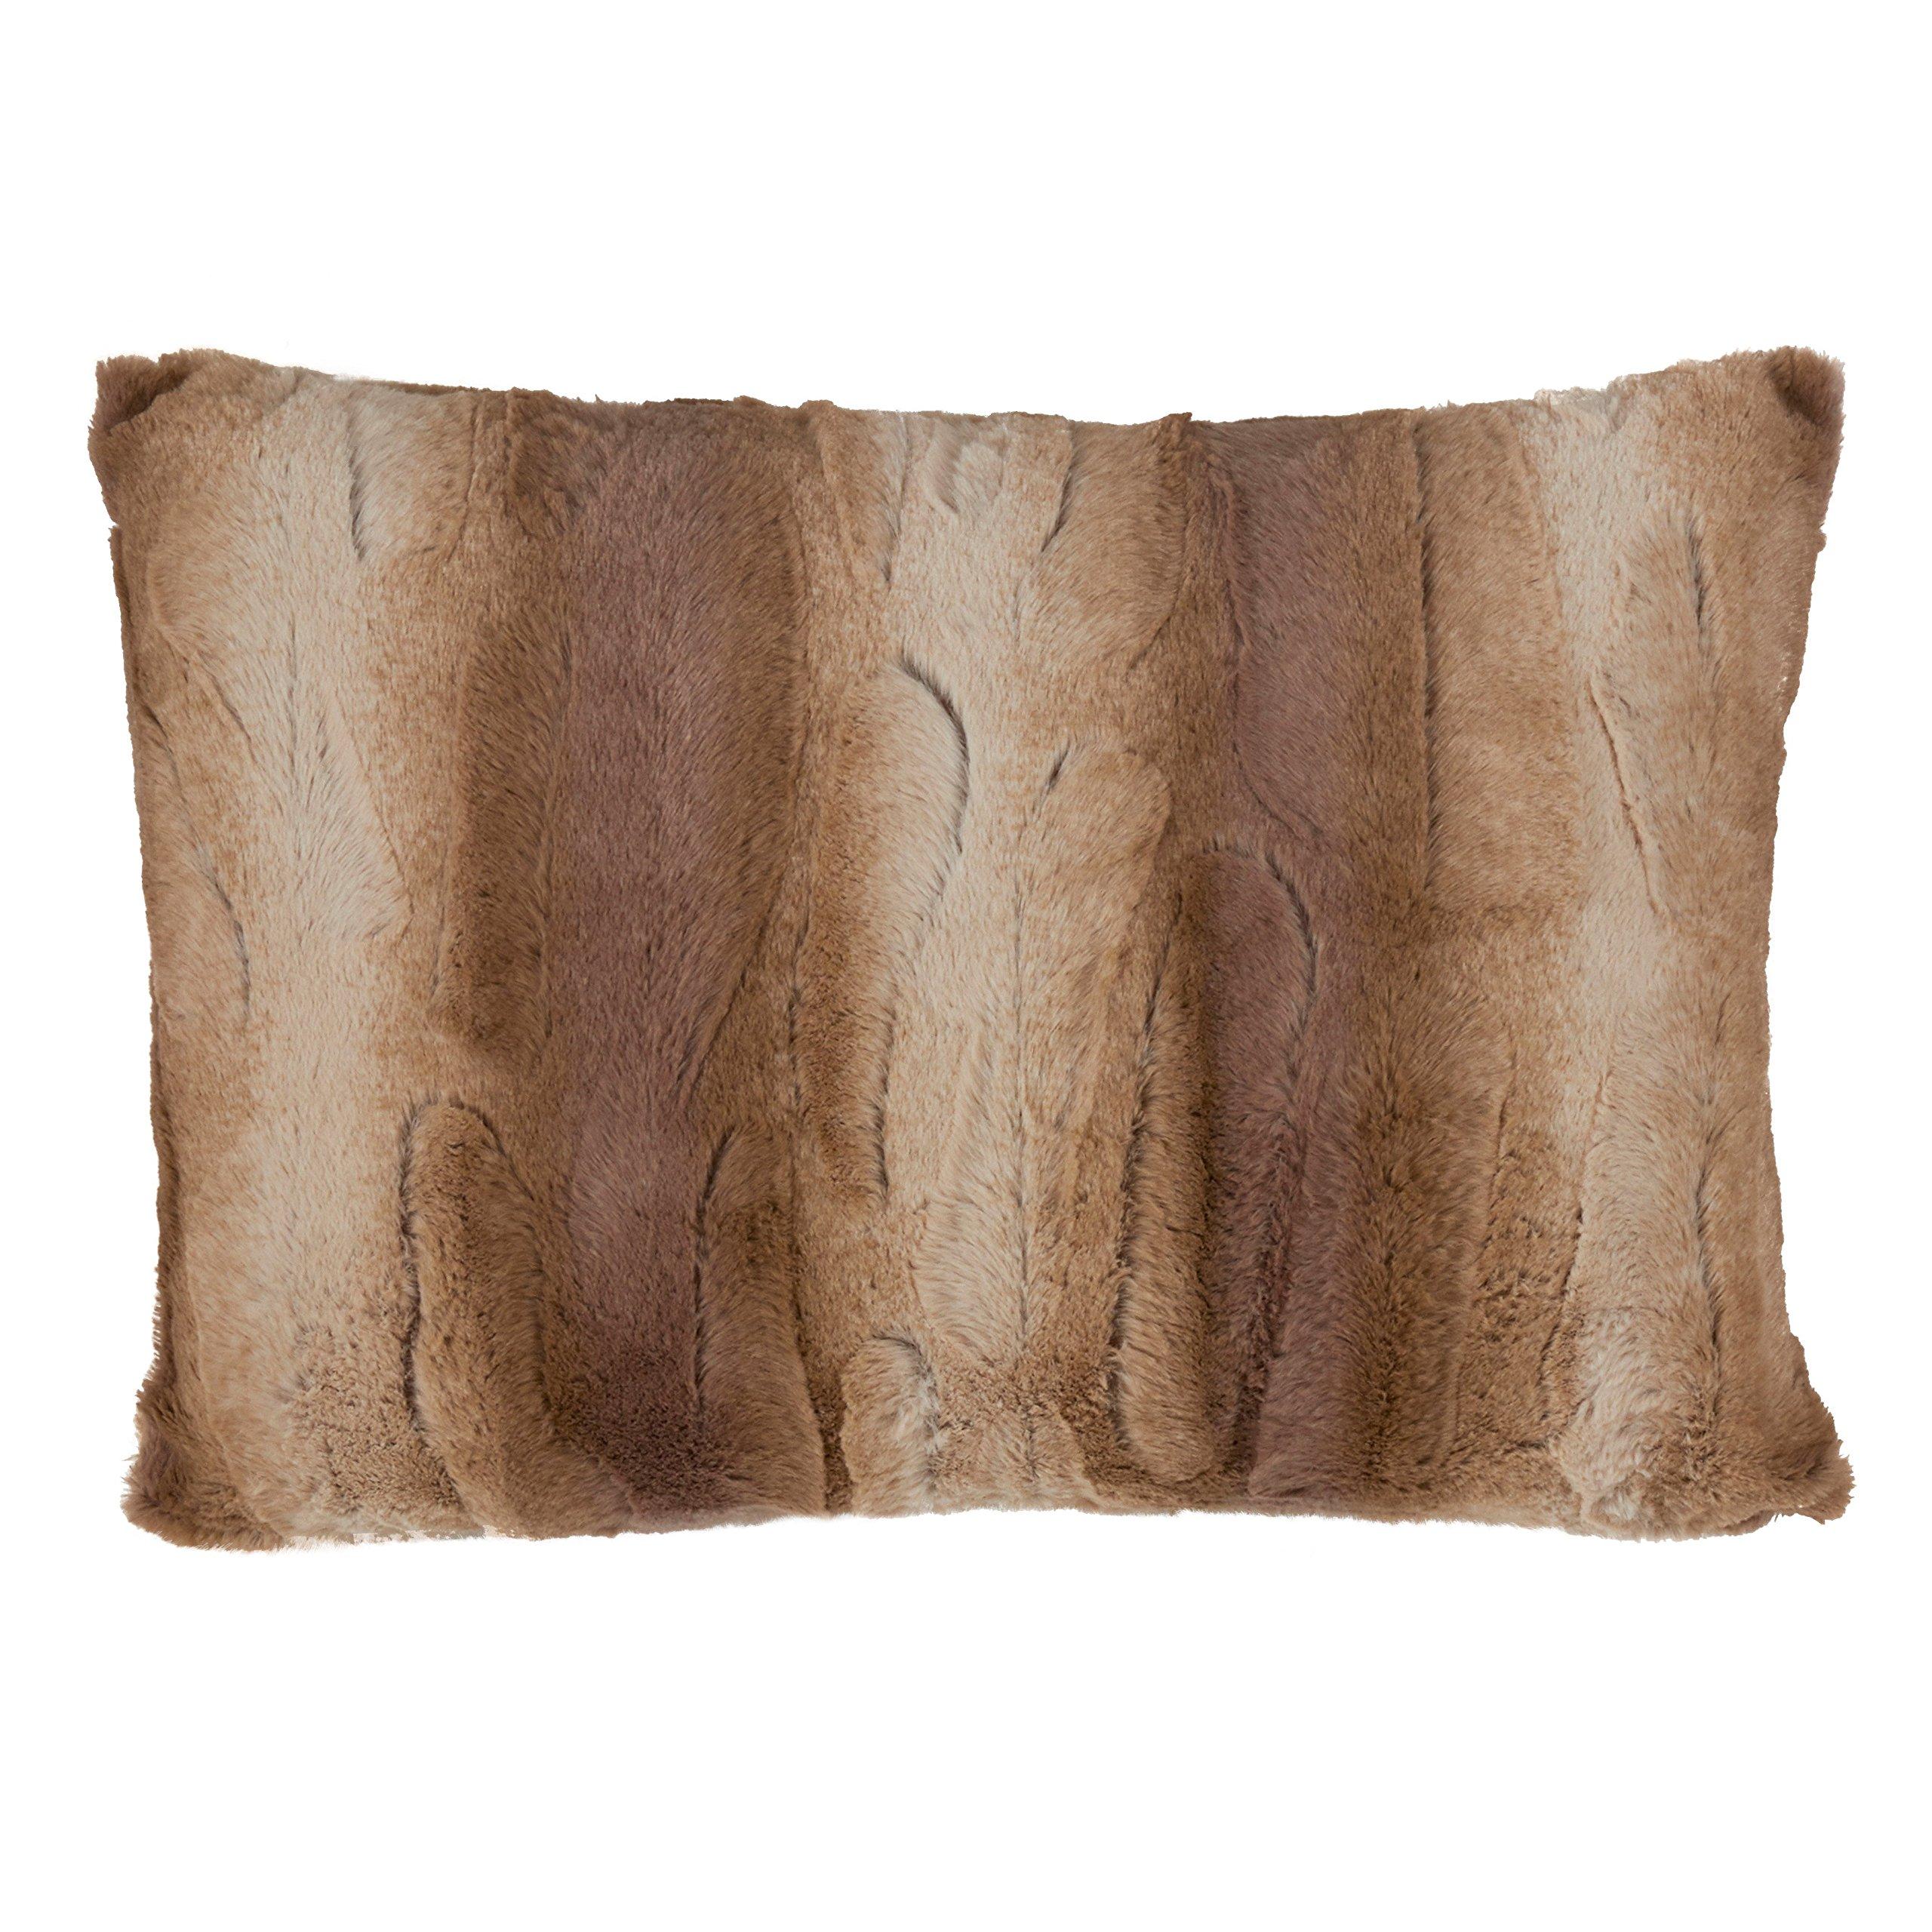 SARO LIFESTYLE Wilma Collection Timeless Animal Print Faux Fur Poly Filled Throw Pillow, 14'' x 20'', Natural